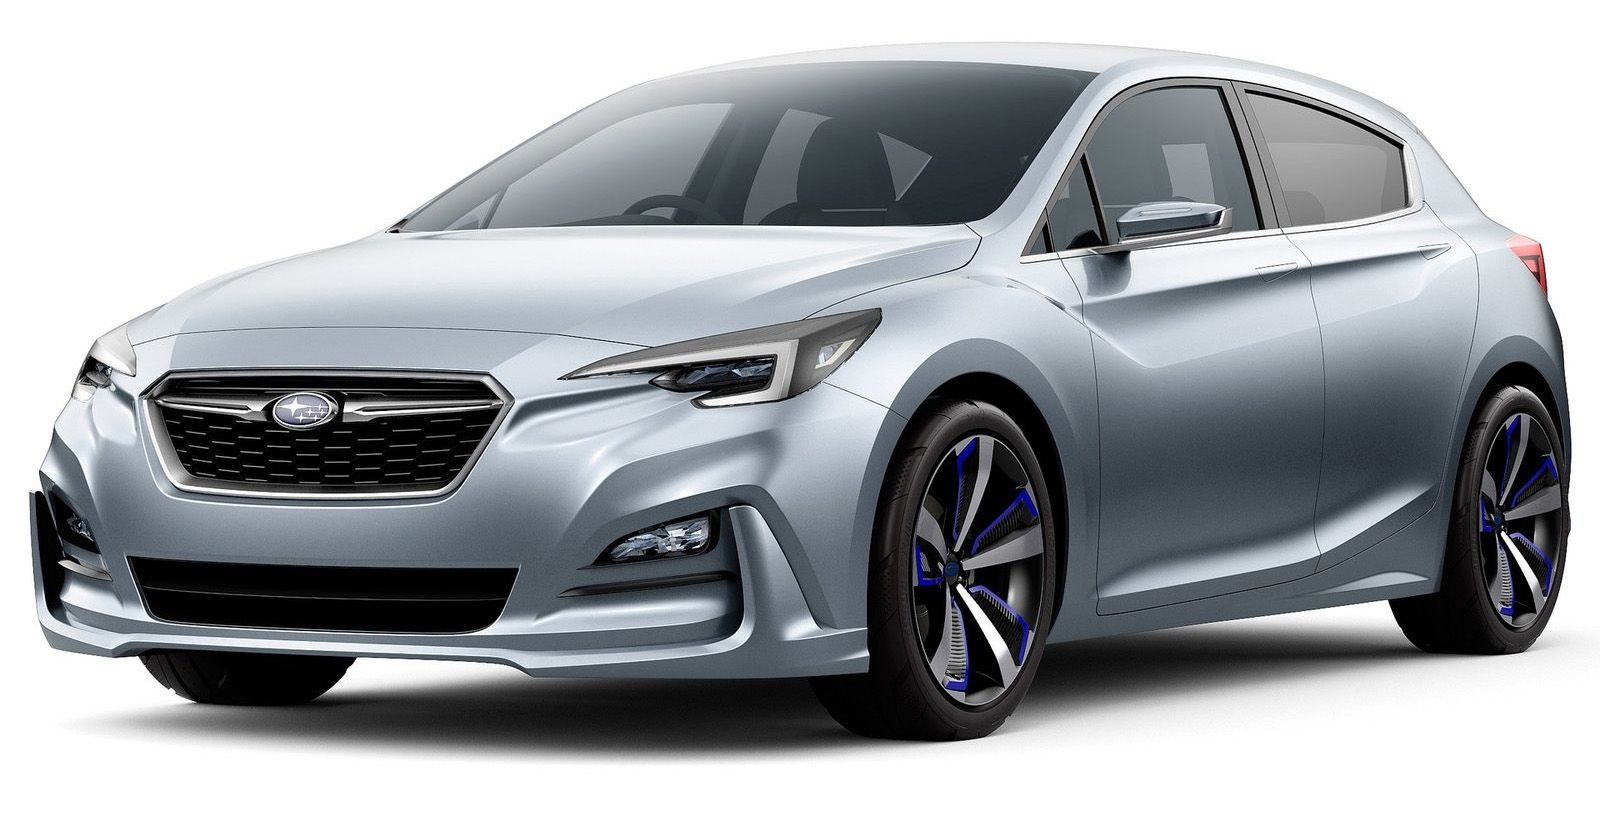 The Subaru Impreza 5 Door Hatch Concept Cranks The Excitement Up Maybe One Or Two Notches Subaru Impreza Impreza Subaru